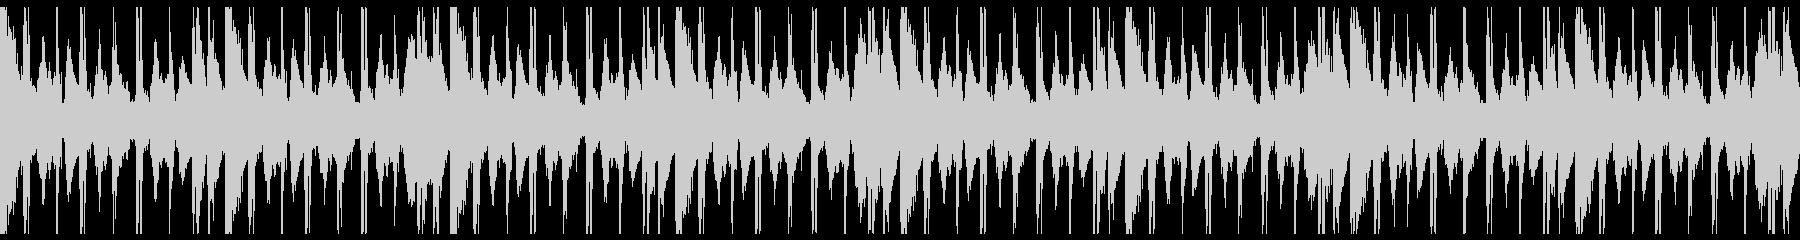 Loop ピアノとウッドベースのLoFiの未再生の波形